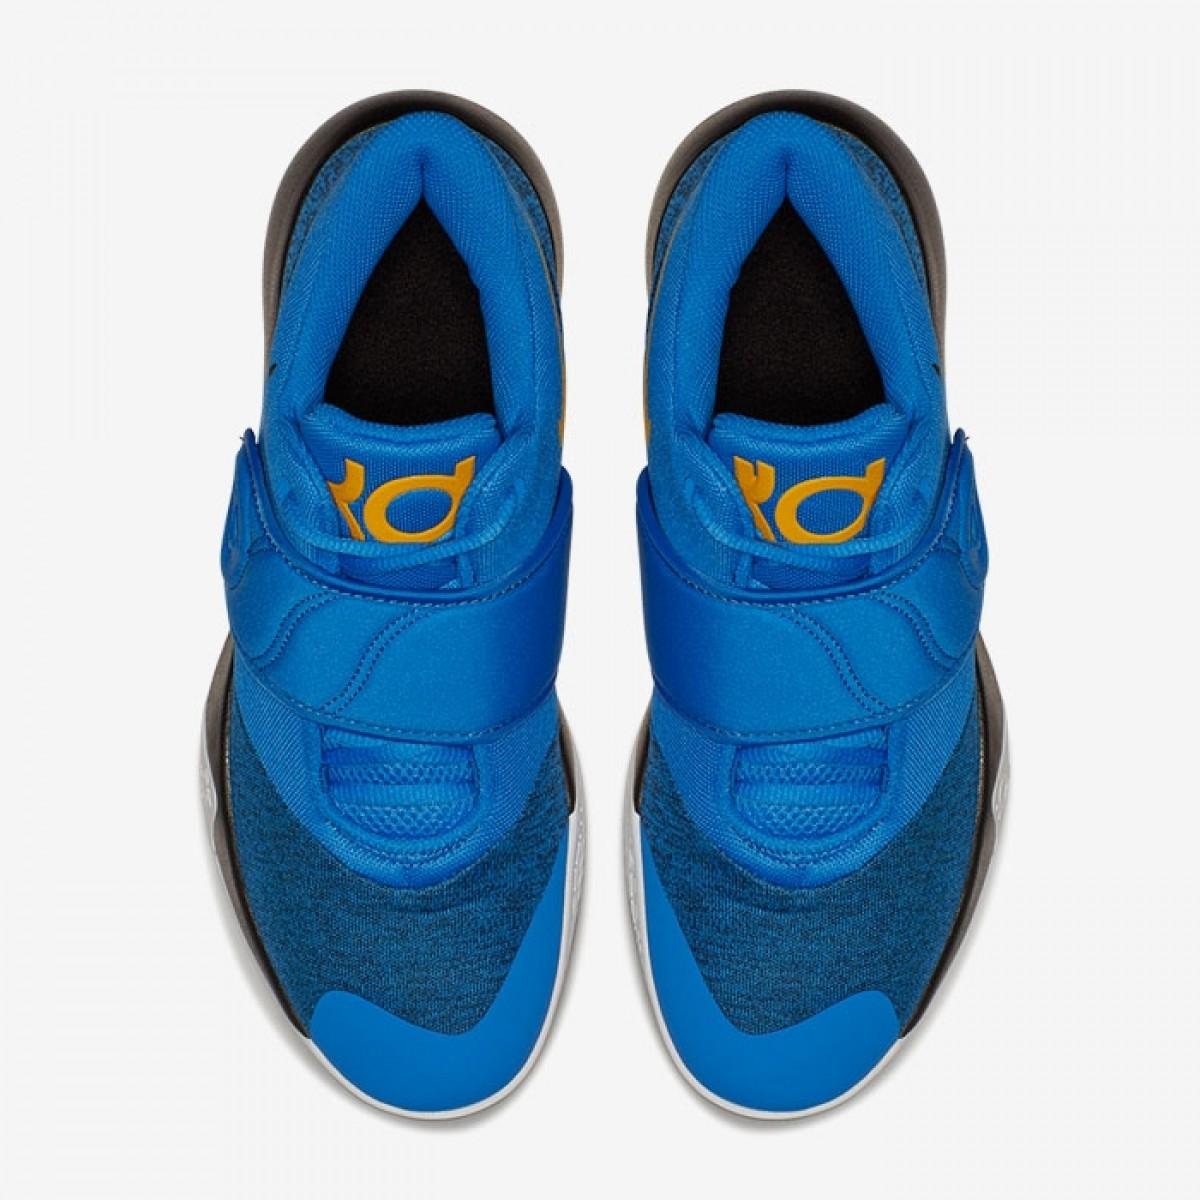 Nike KD Trey 5 VI 'Warriors' AA7067-401